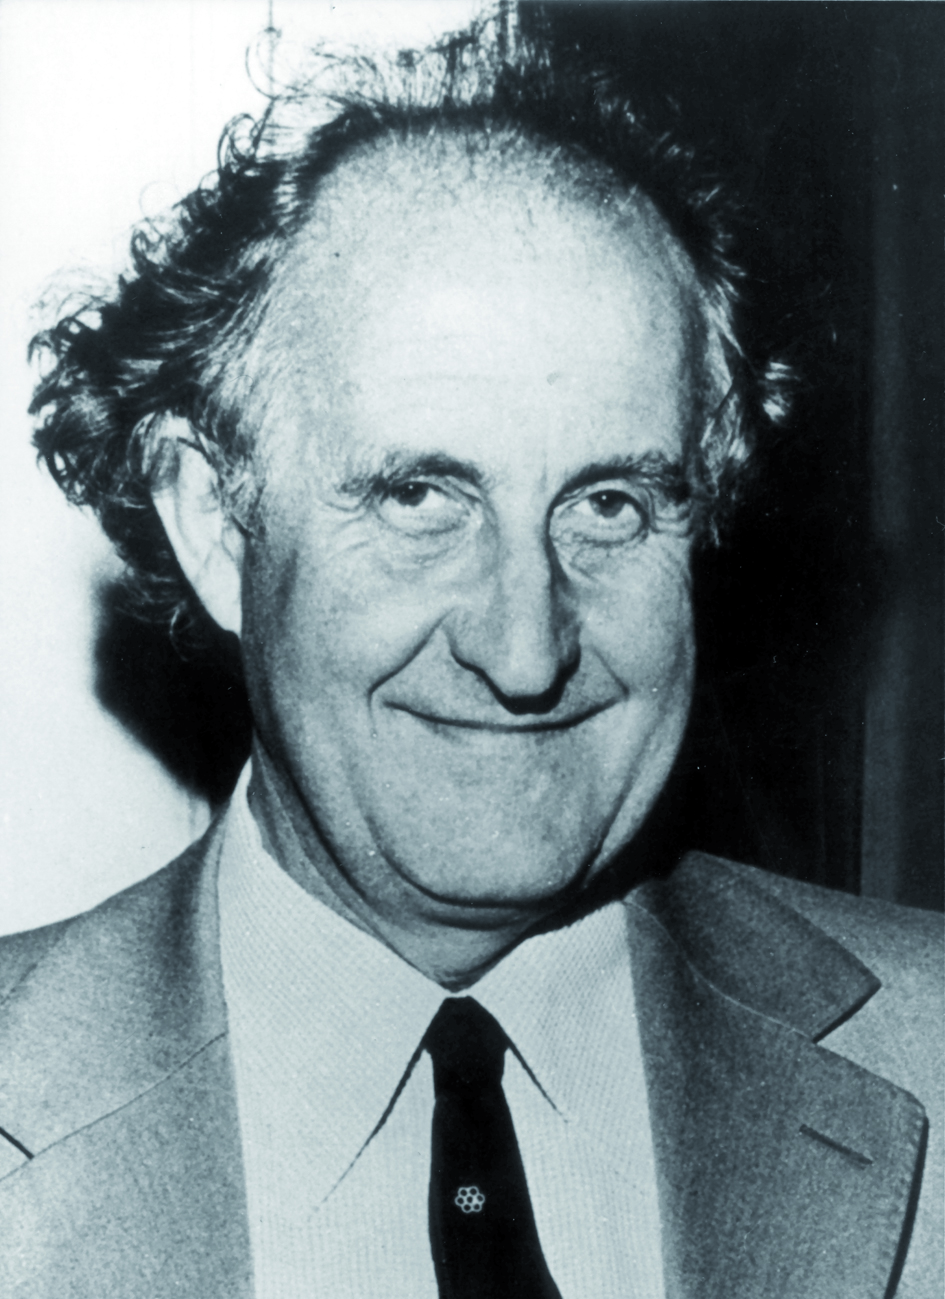 Portraitfoto von Herrn John Francis Fowler.